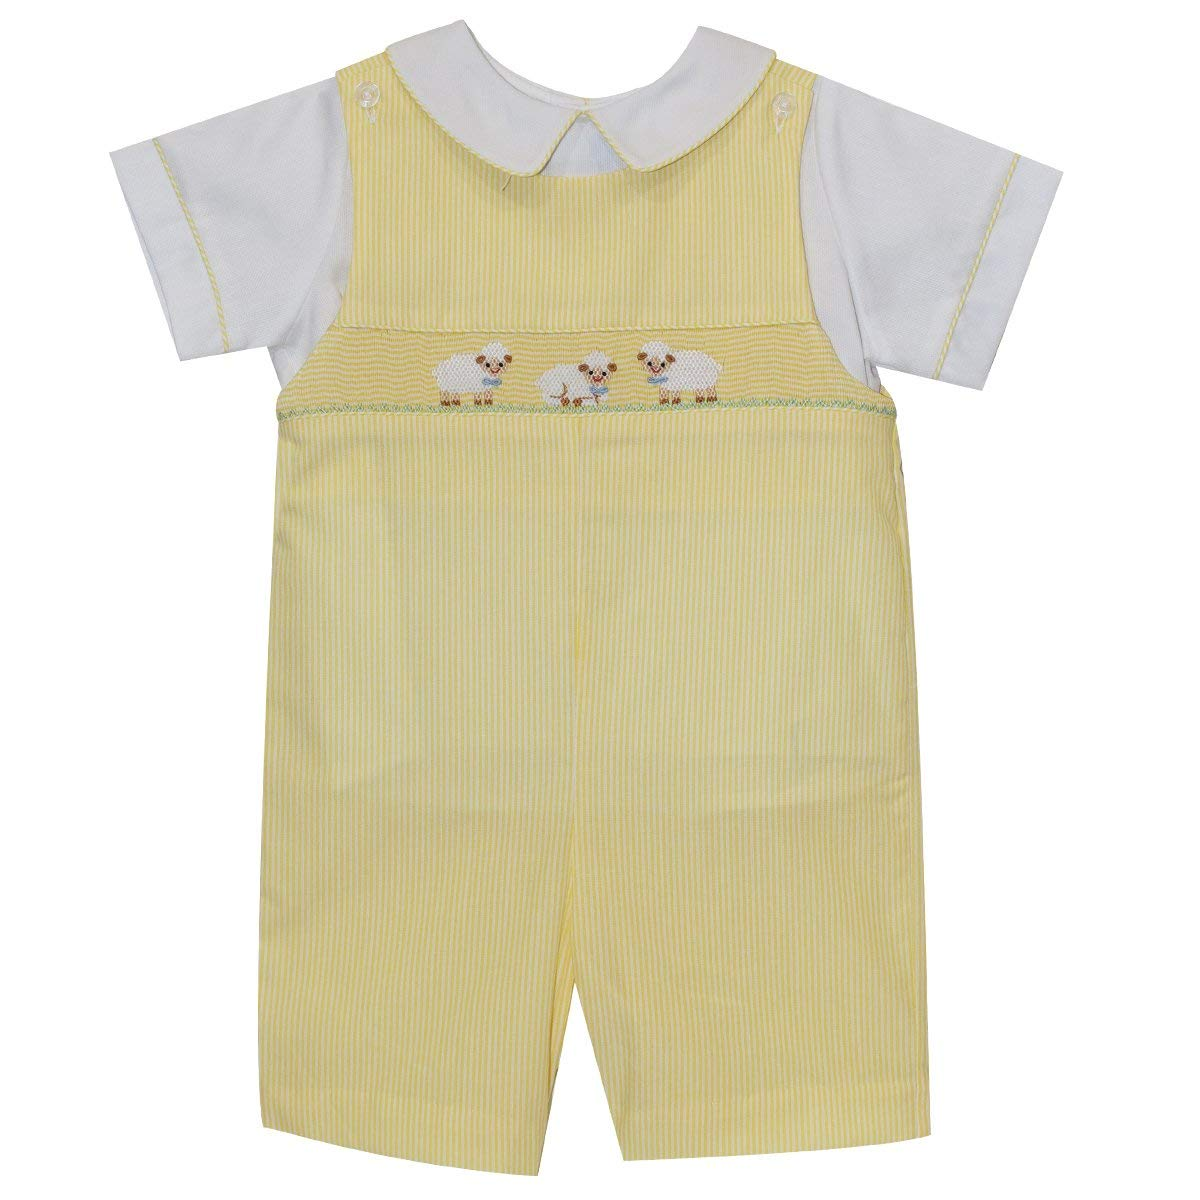 Lamb Smocked Boys Shortall Short Sleeve Yellow